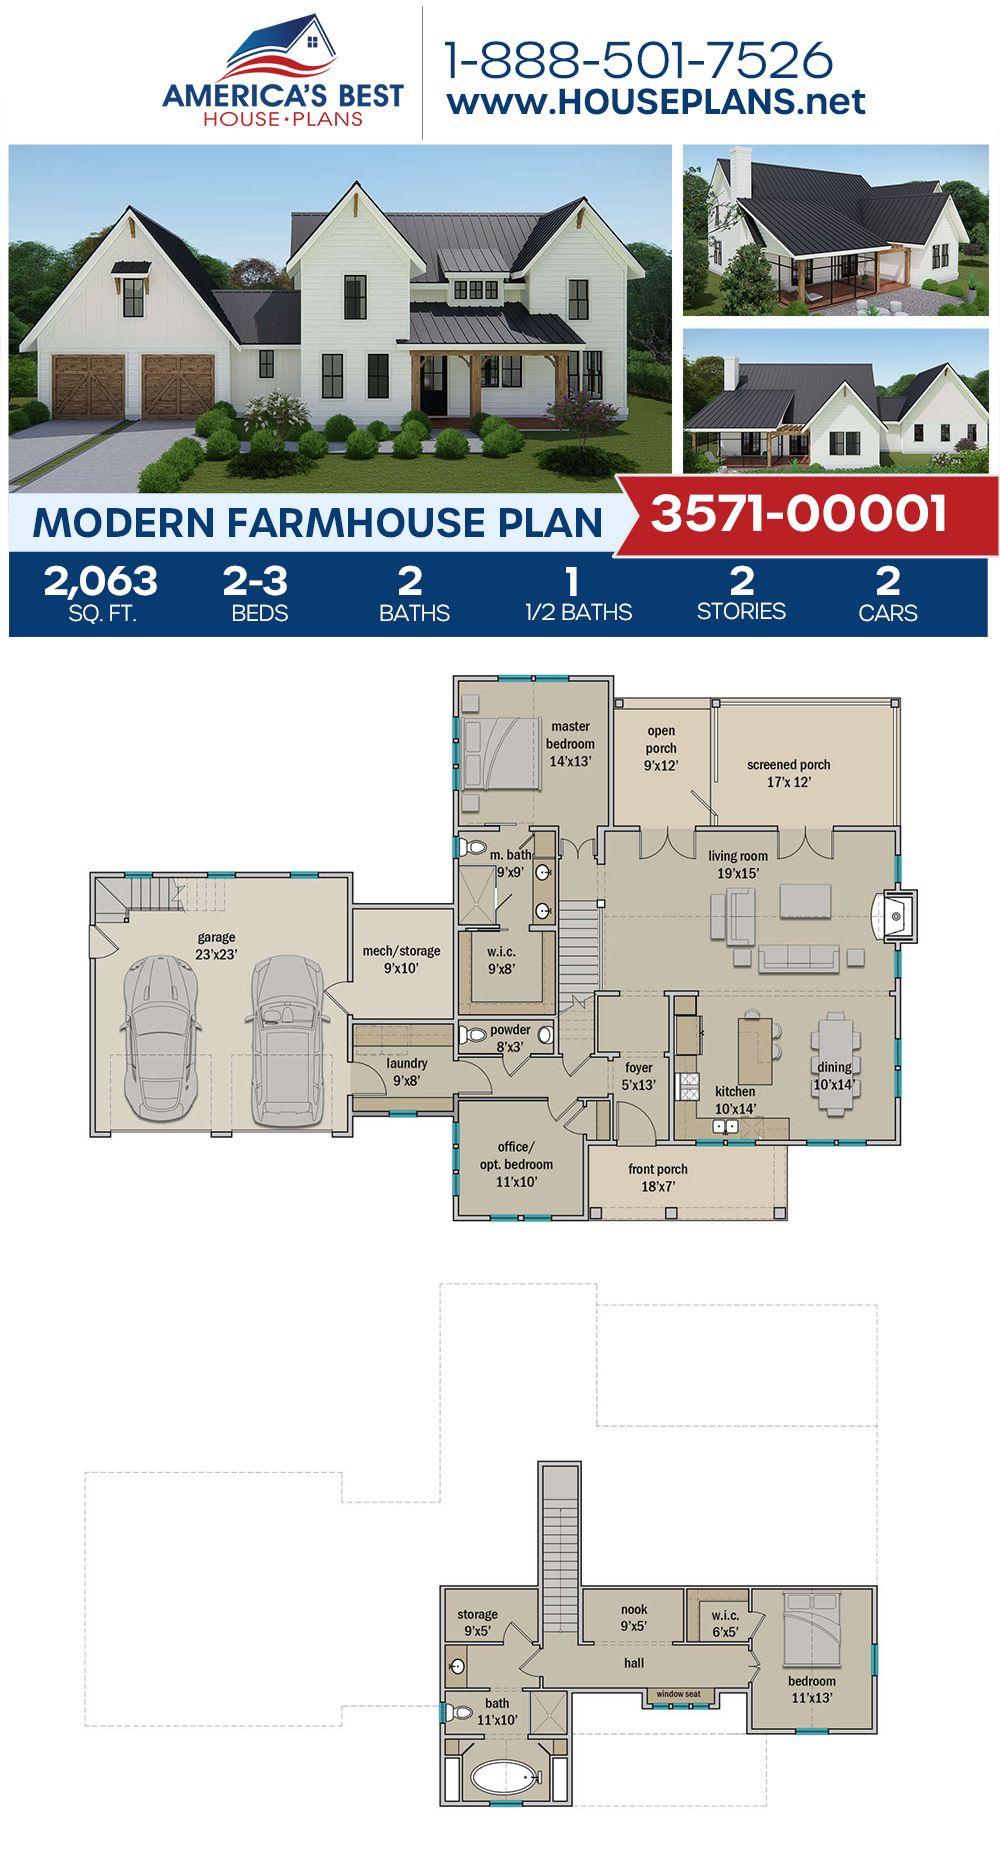 Modern Farmhouse Plan 3571 00001 House Plans Farmhouse Farmhouse Plans Modern Farmhouse Plans